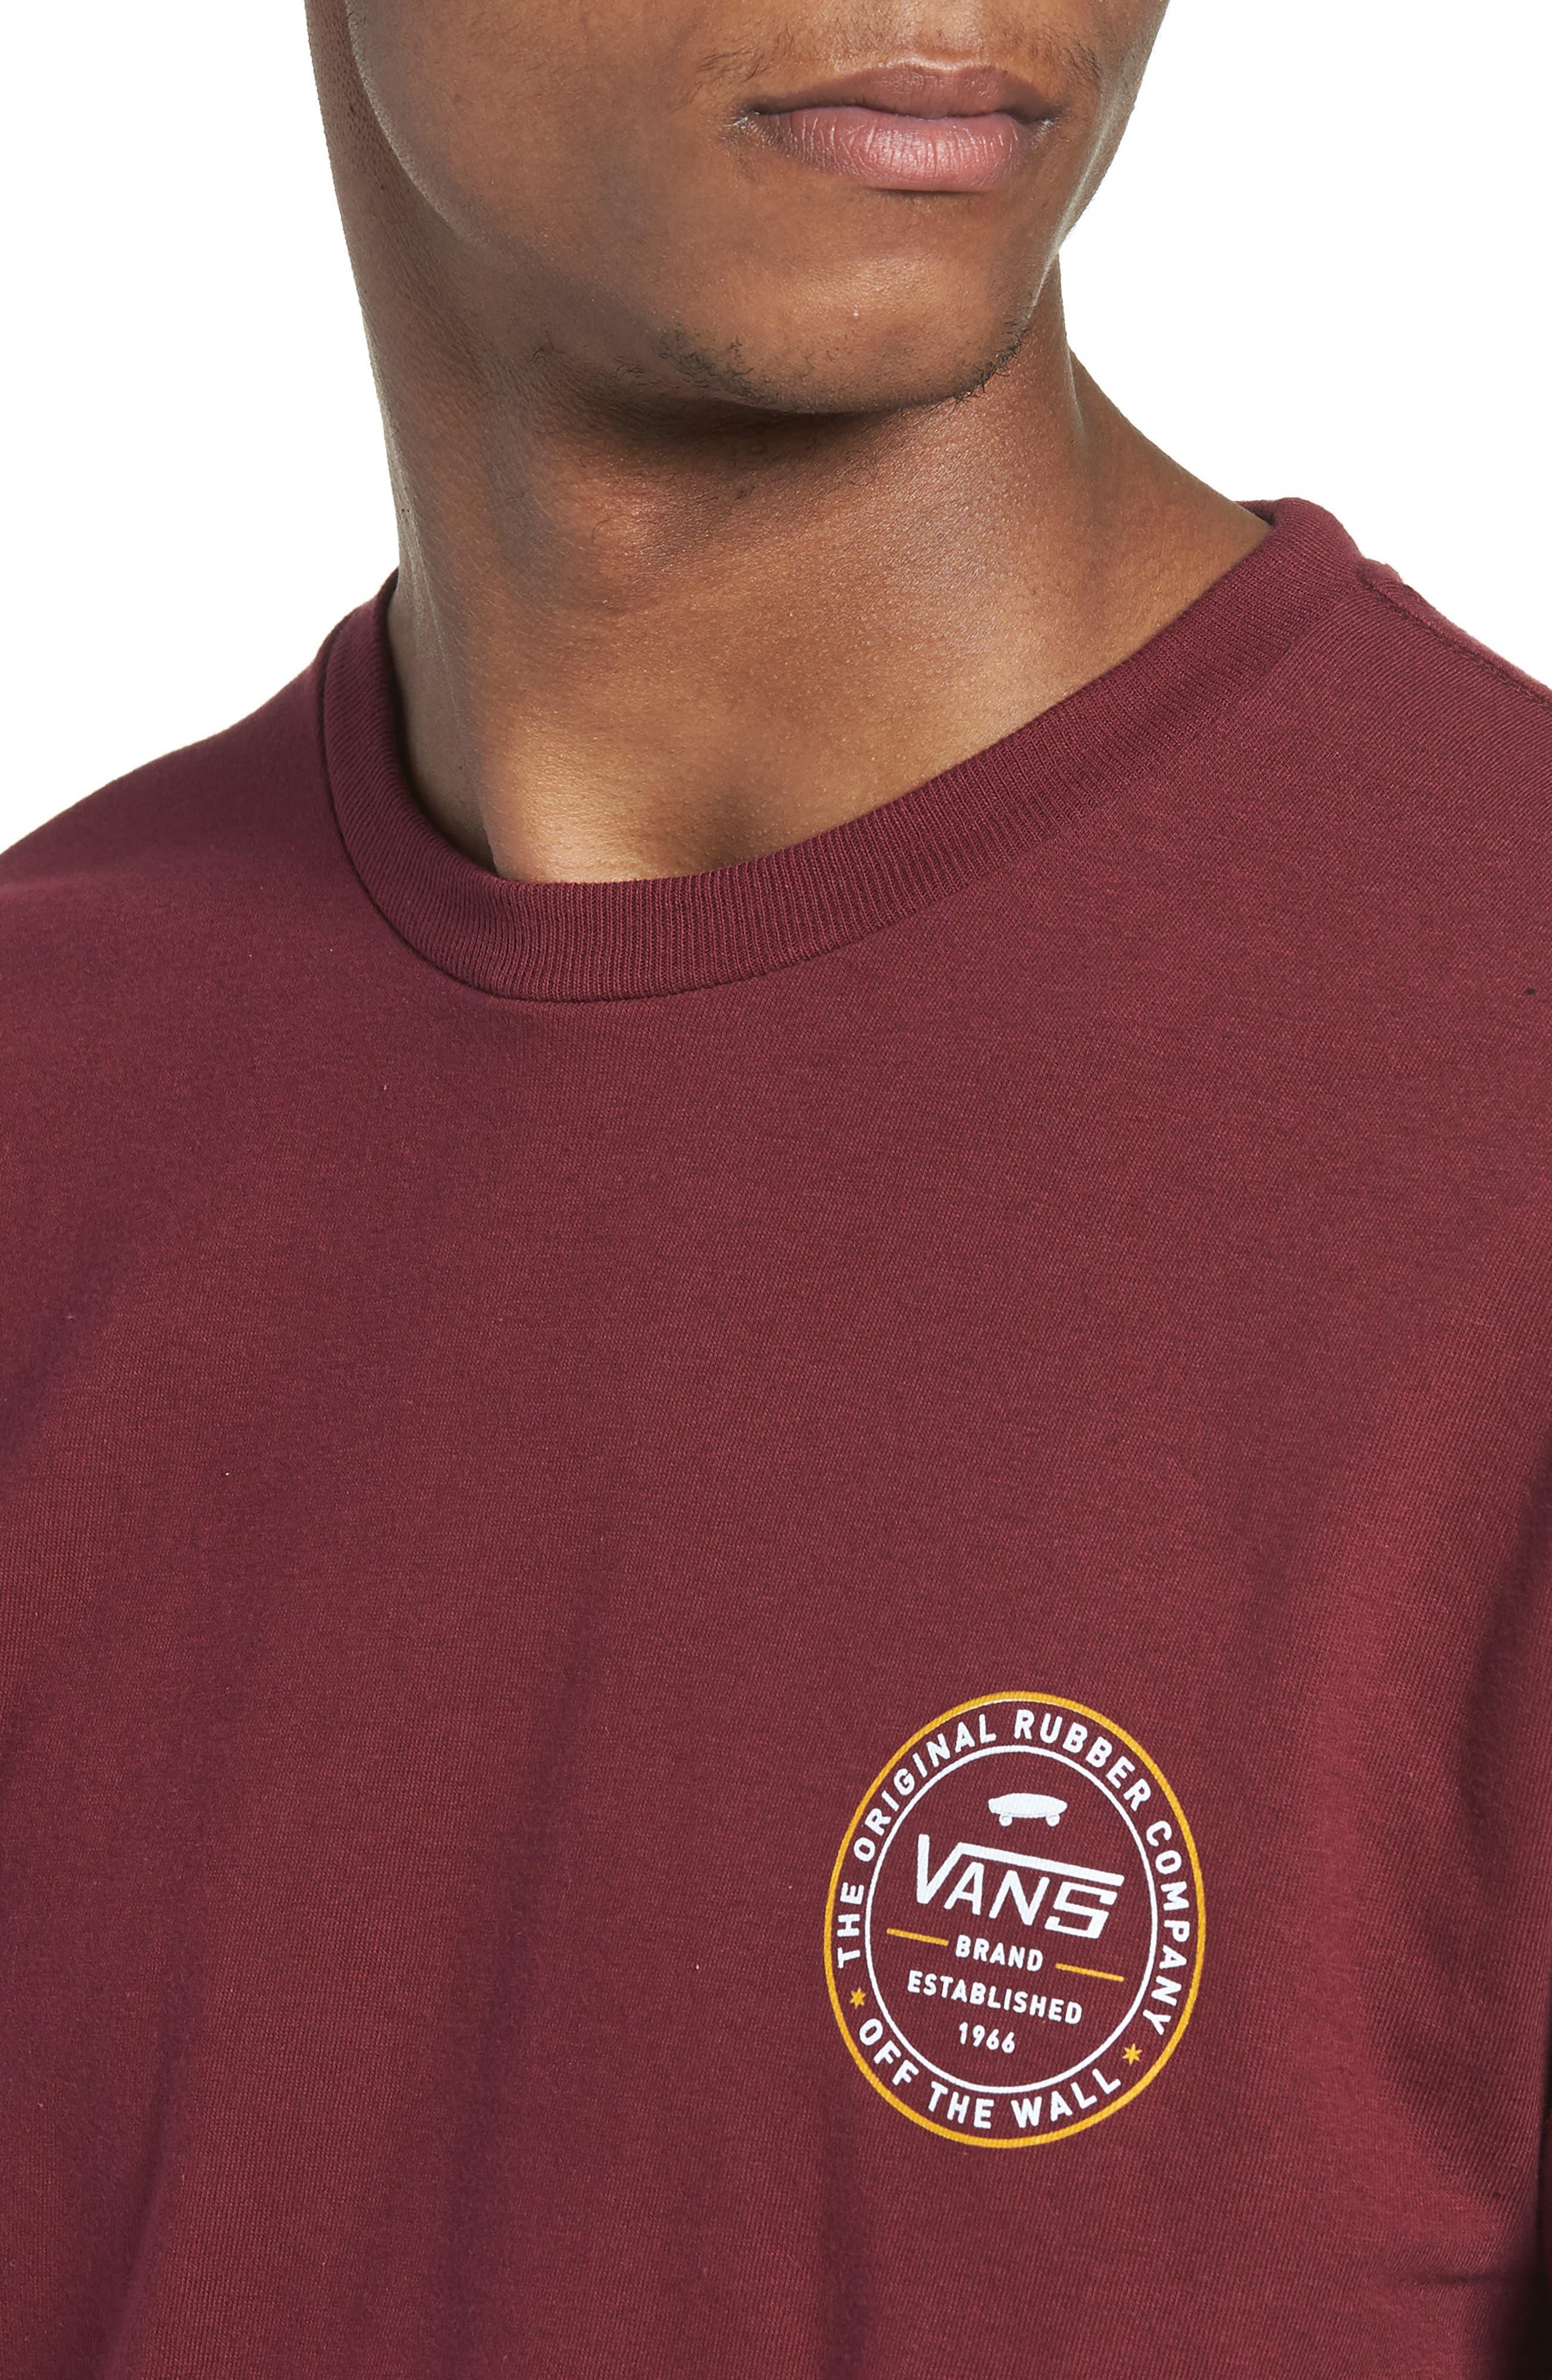 Established '66 Graphic T-Shirt,                             Alternate thumbnail 8, color,